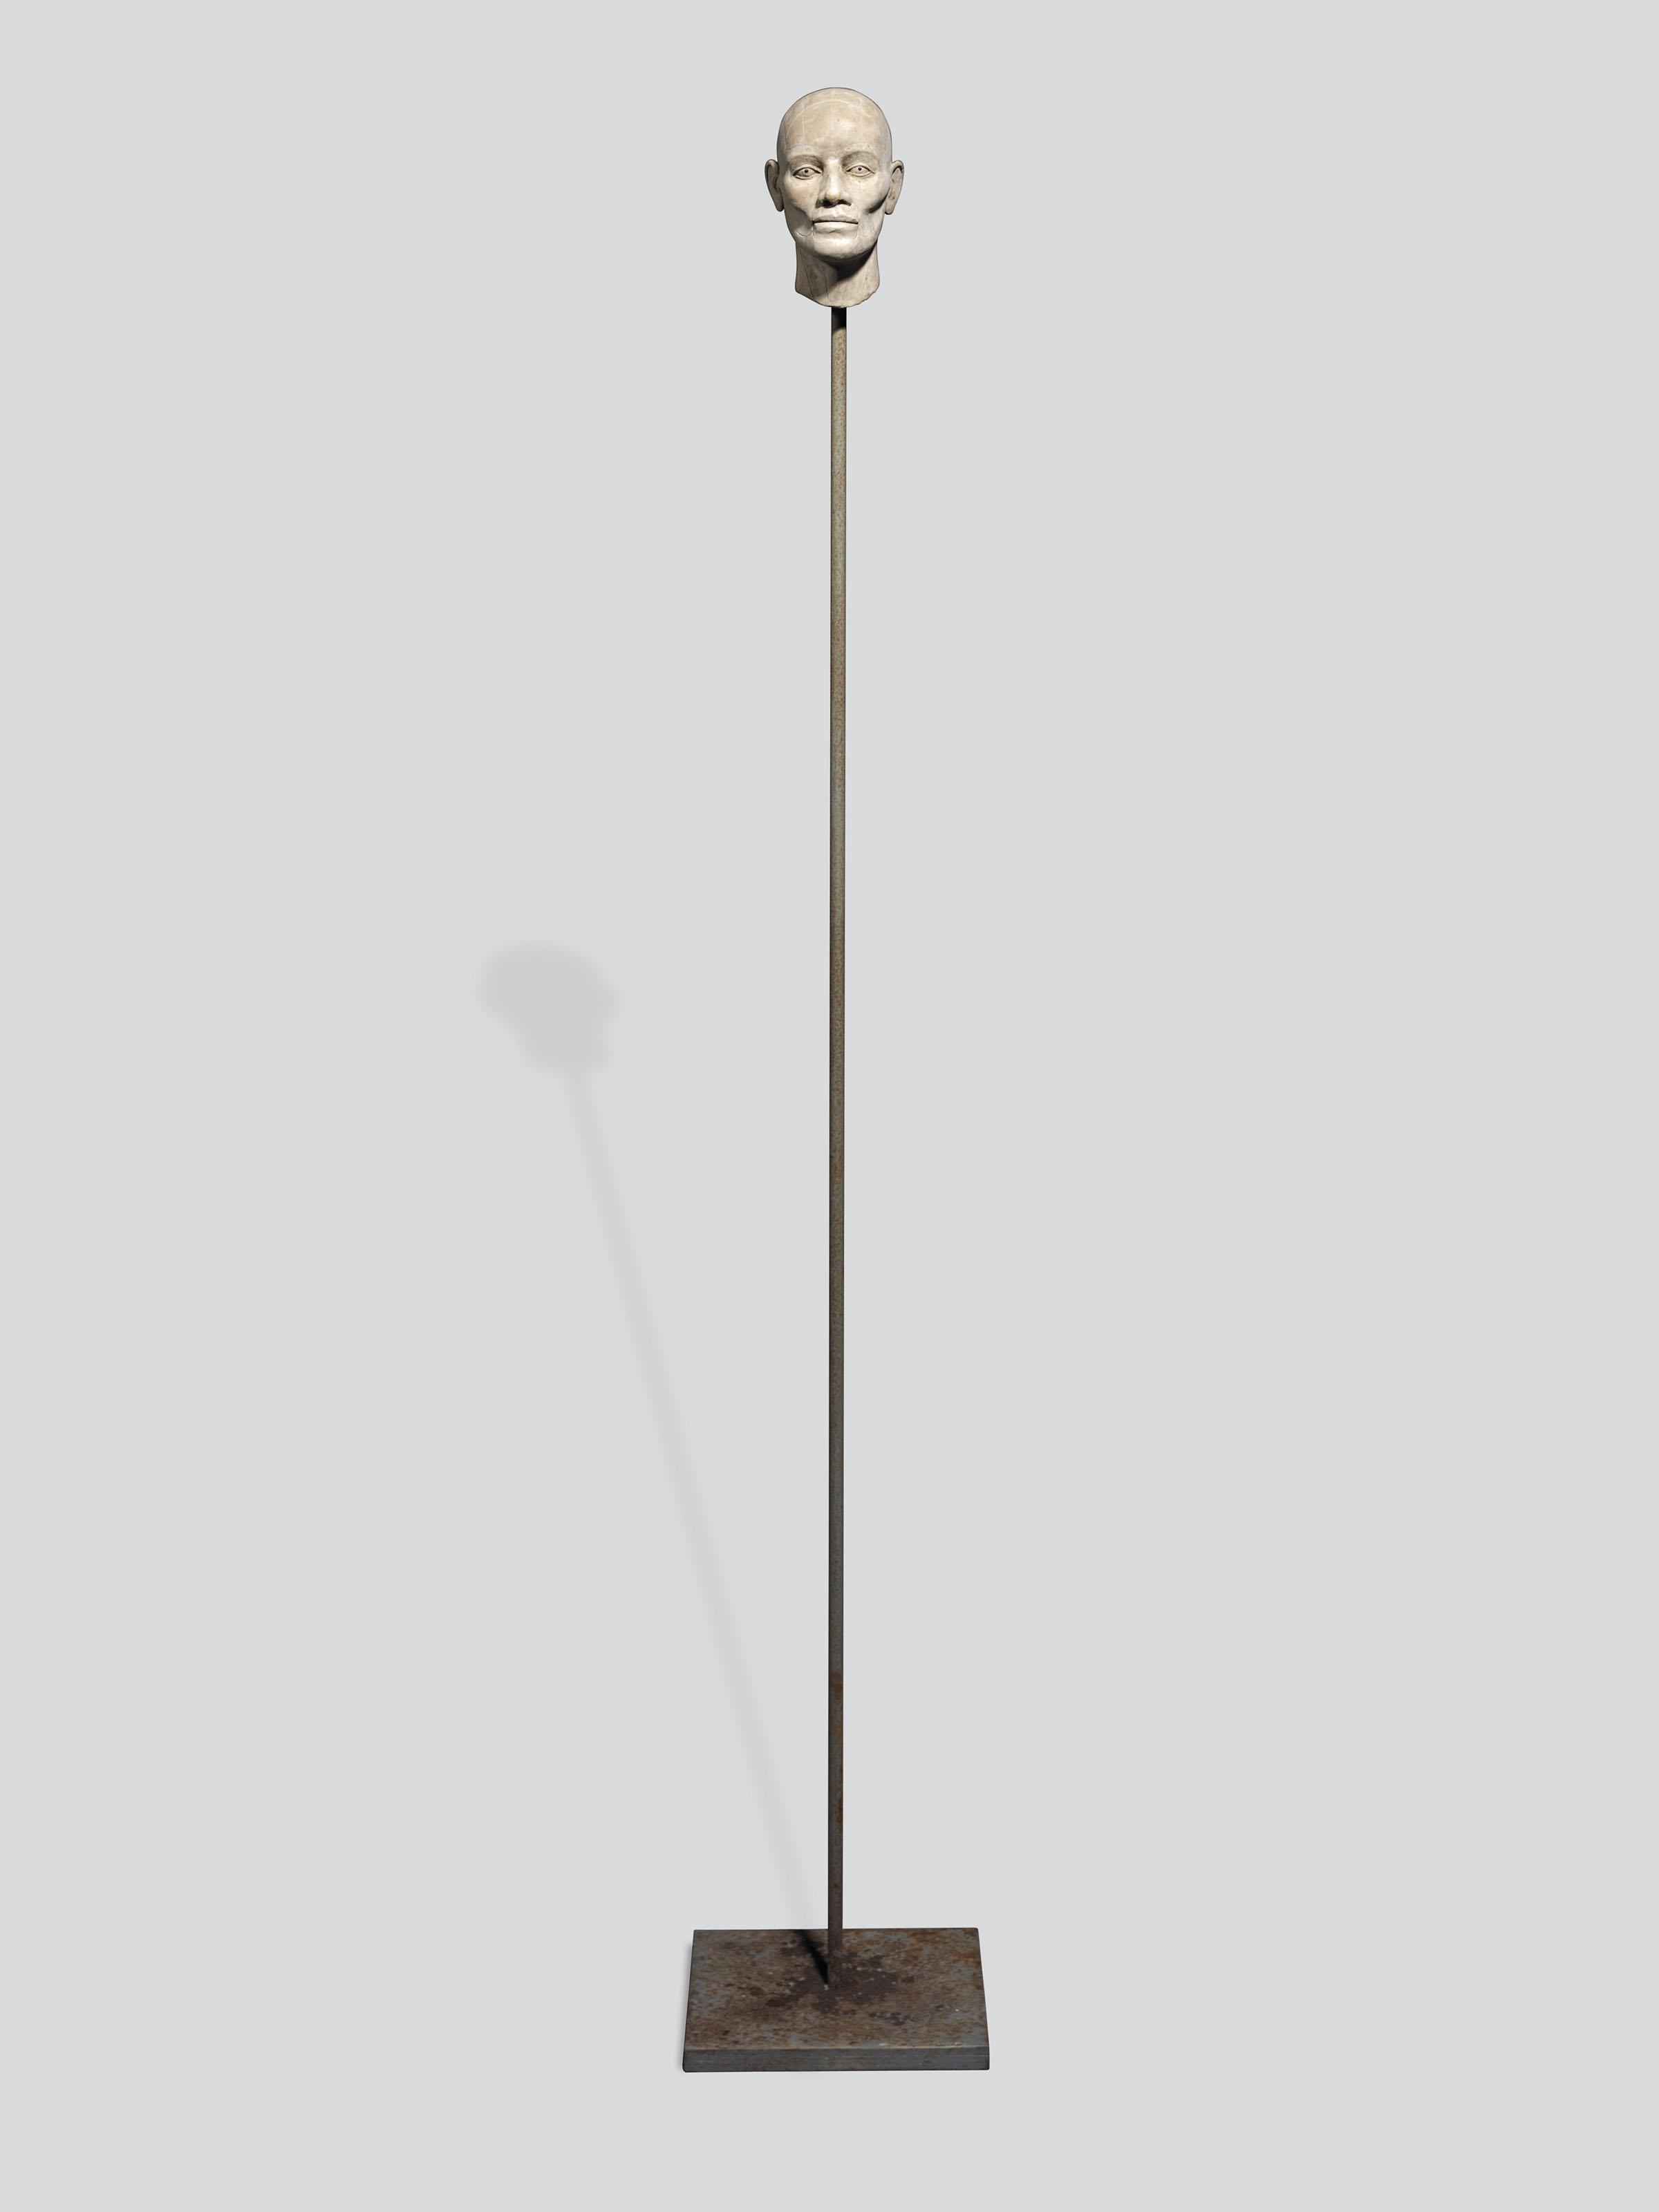 Head on a stick